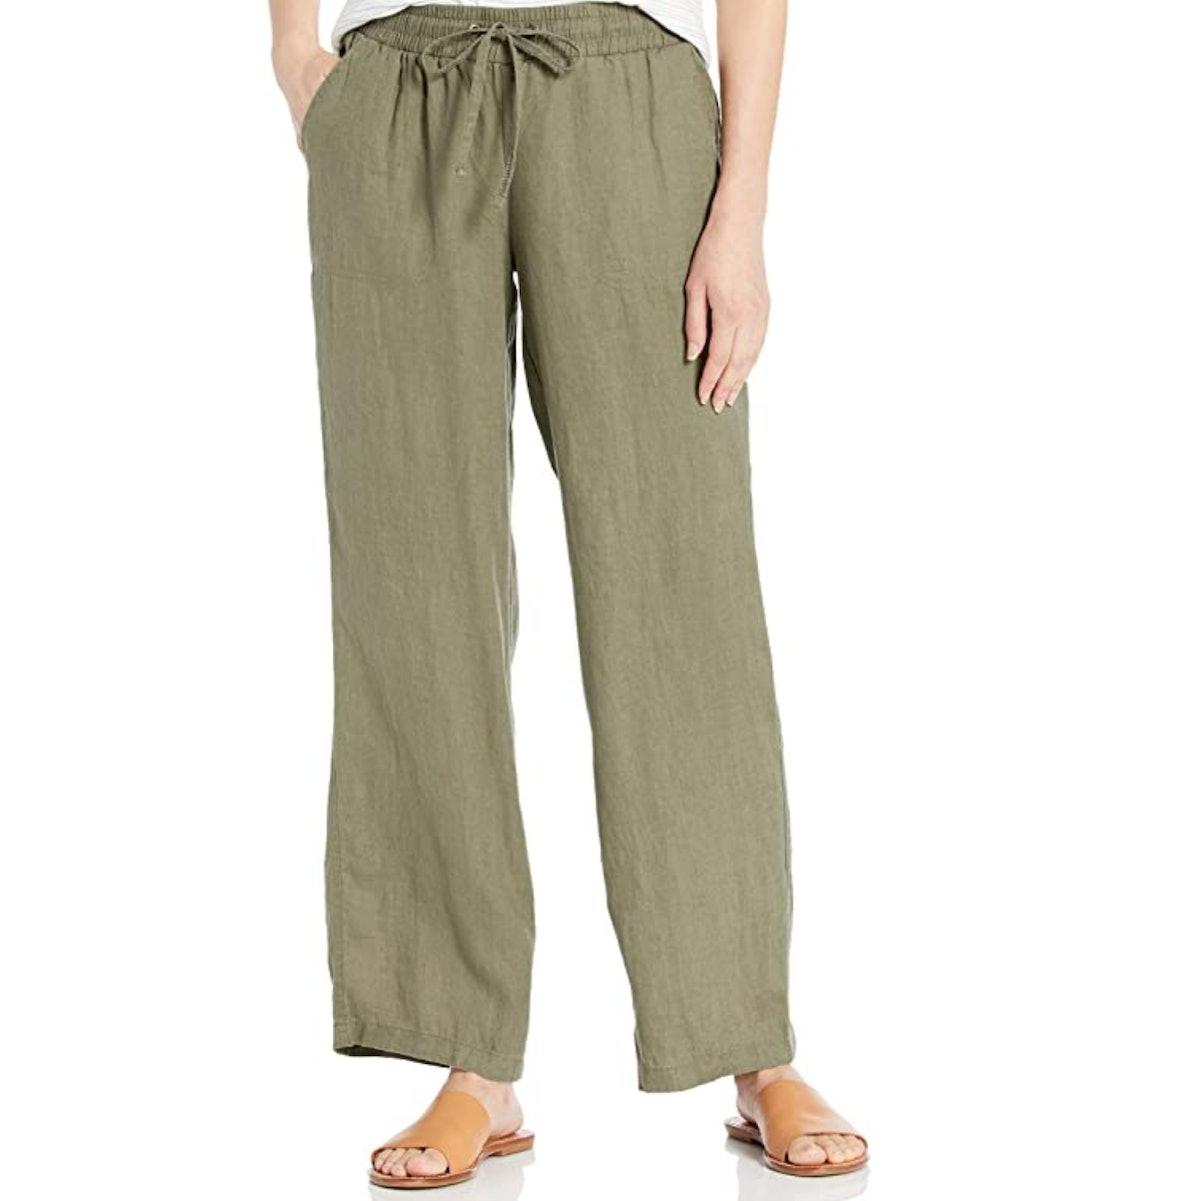 Amazon Essentials Drawstring Linen Wide Leg Pant